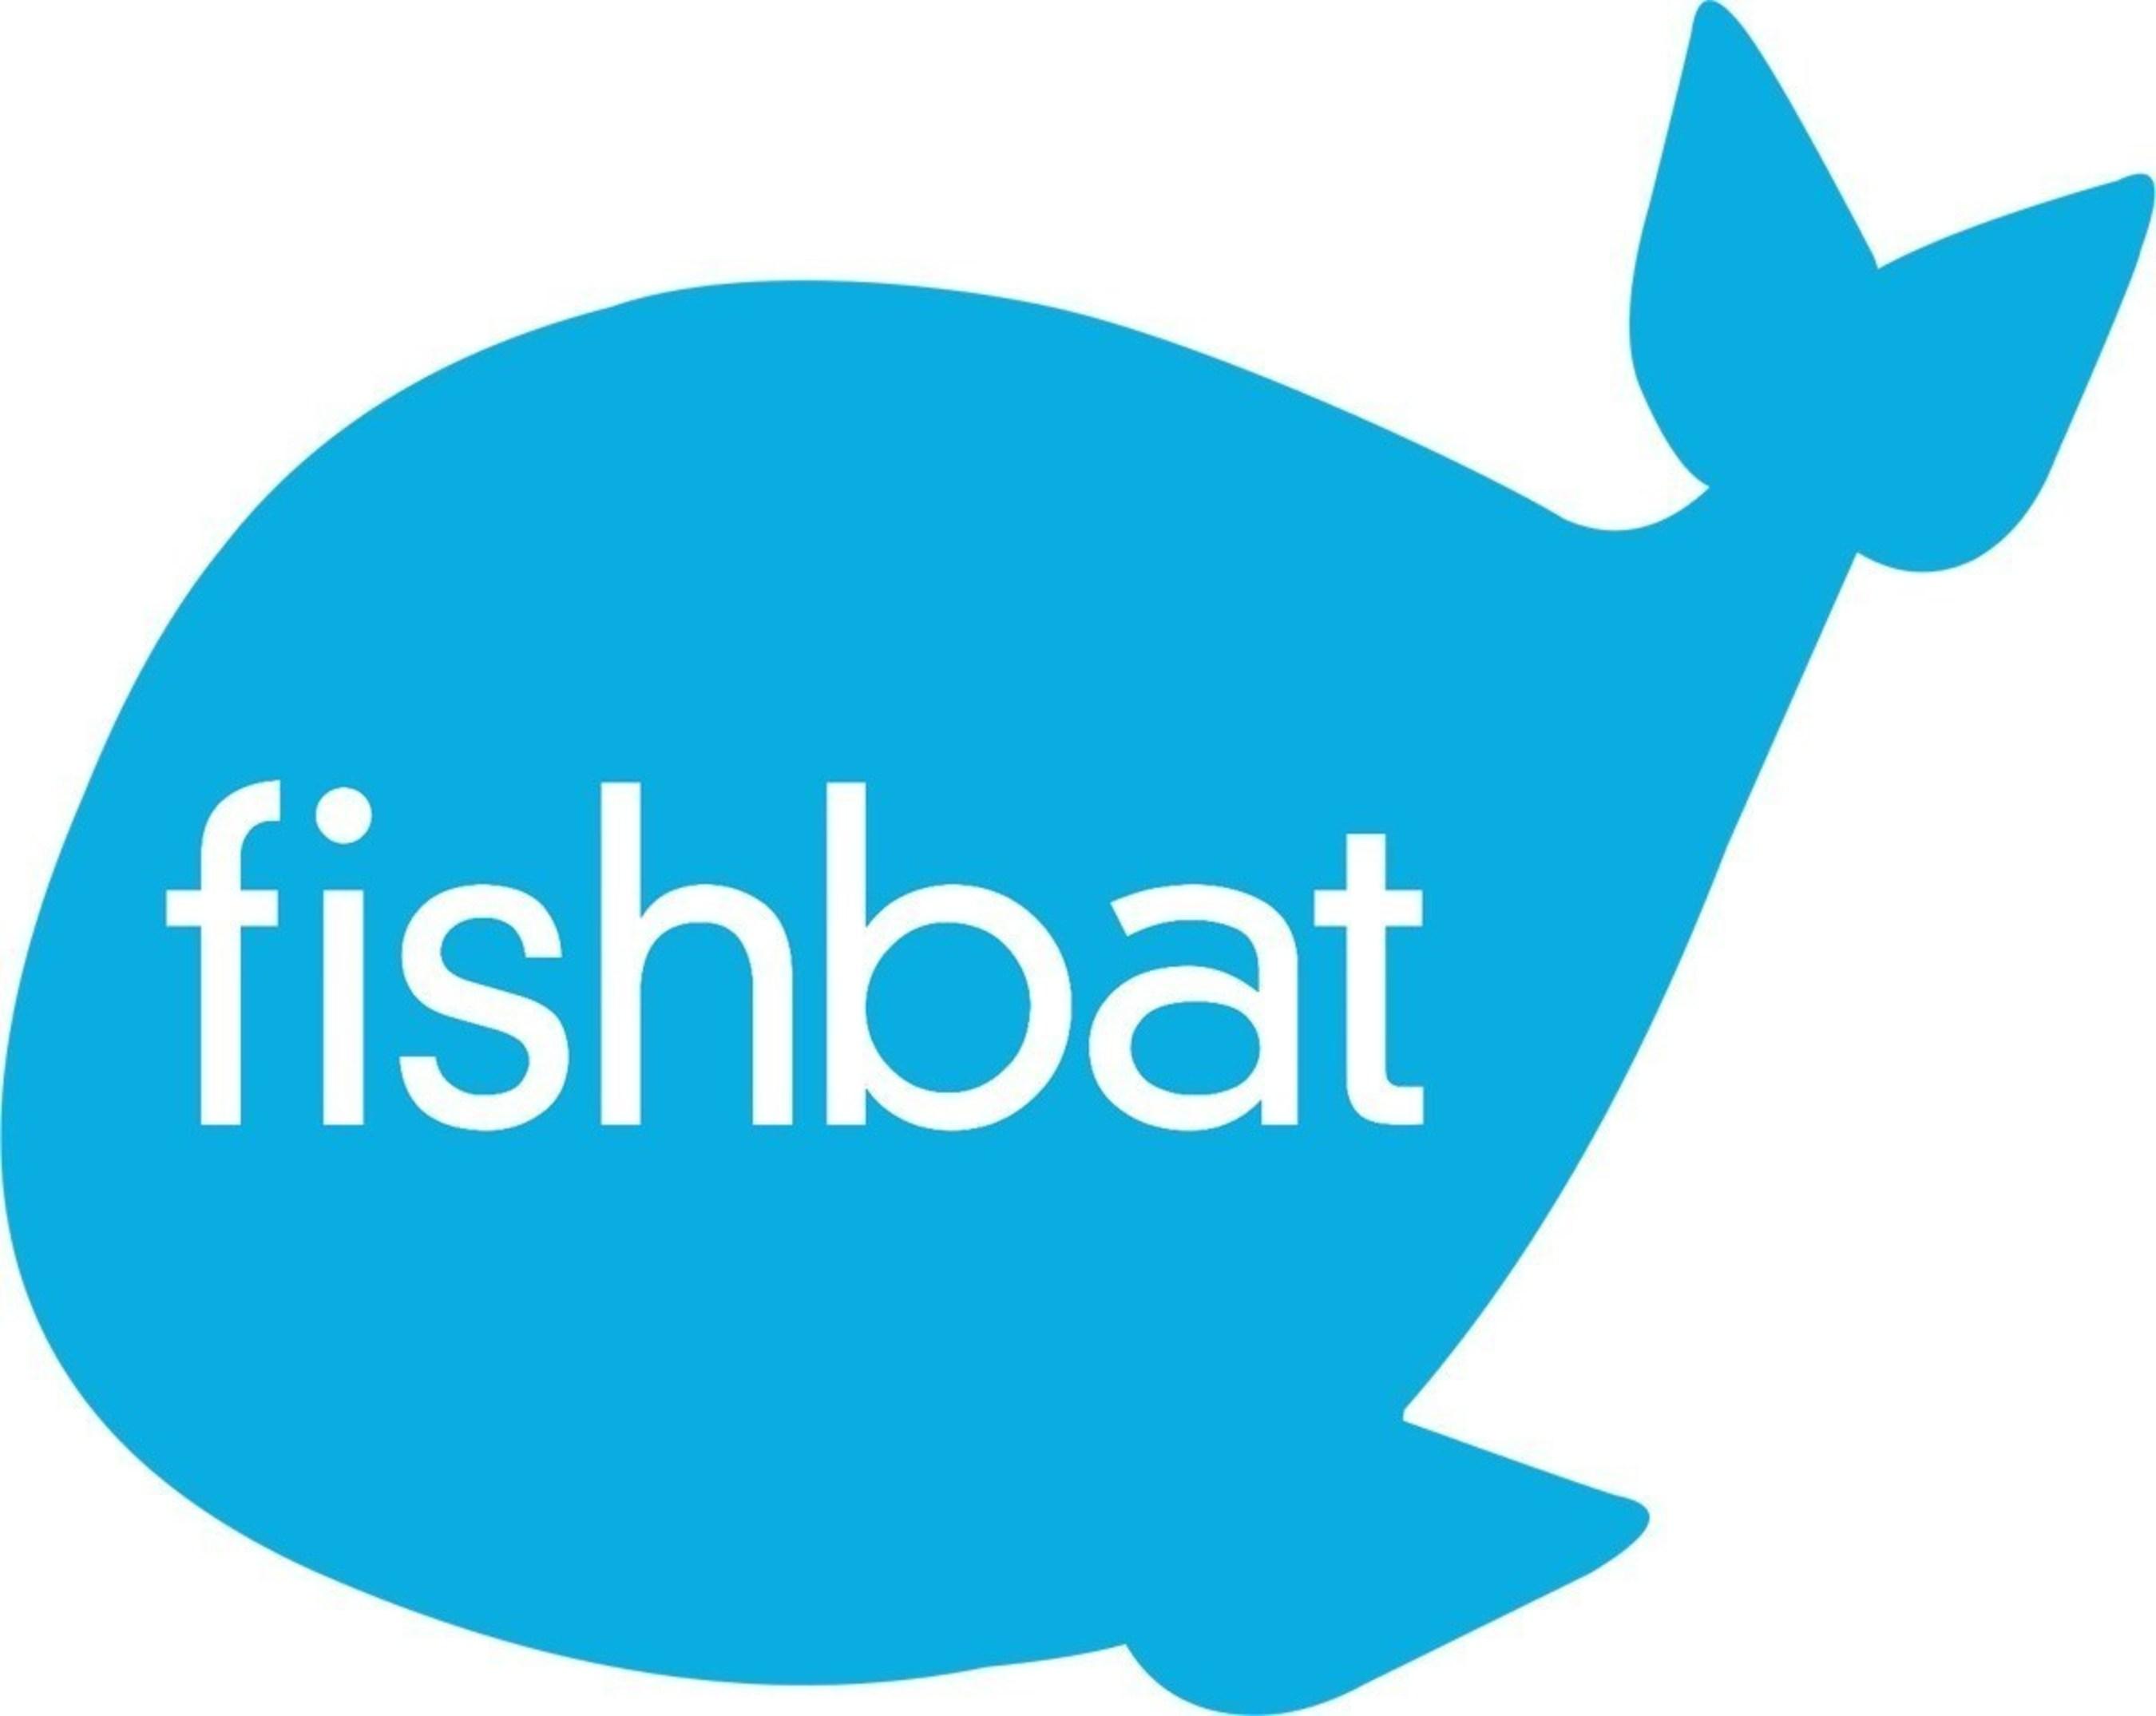 fishbat CEO Clay Darrohn Discusses How Long it Takes for Social Media Marketing to Pay Off